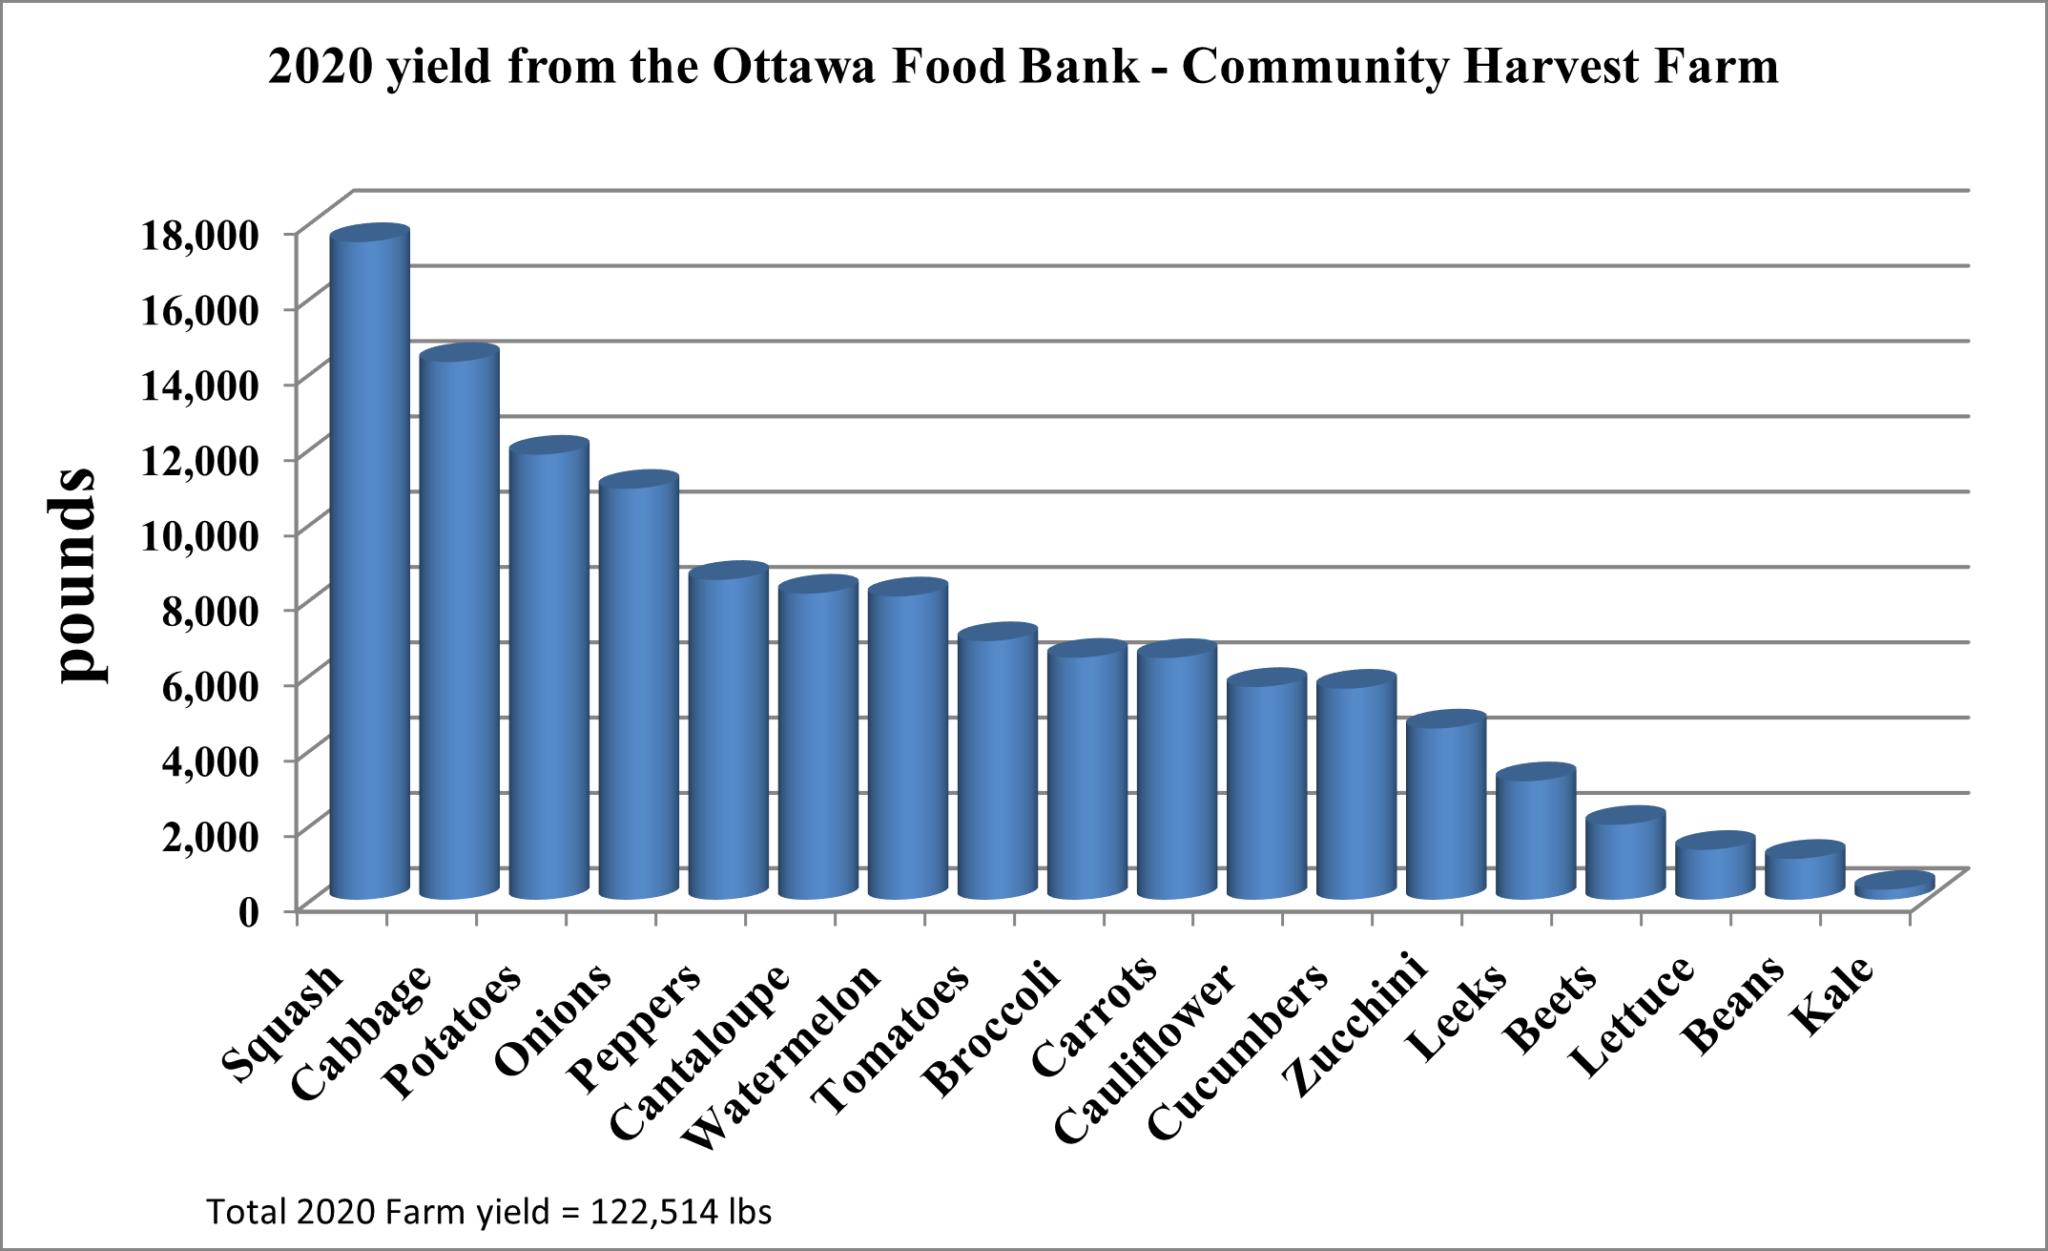 Community Harvest Farm Yield